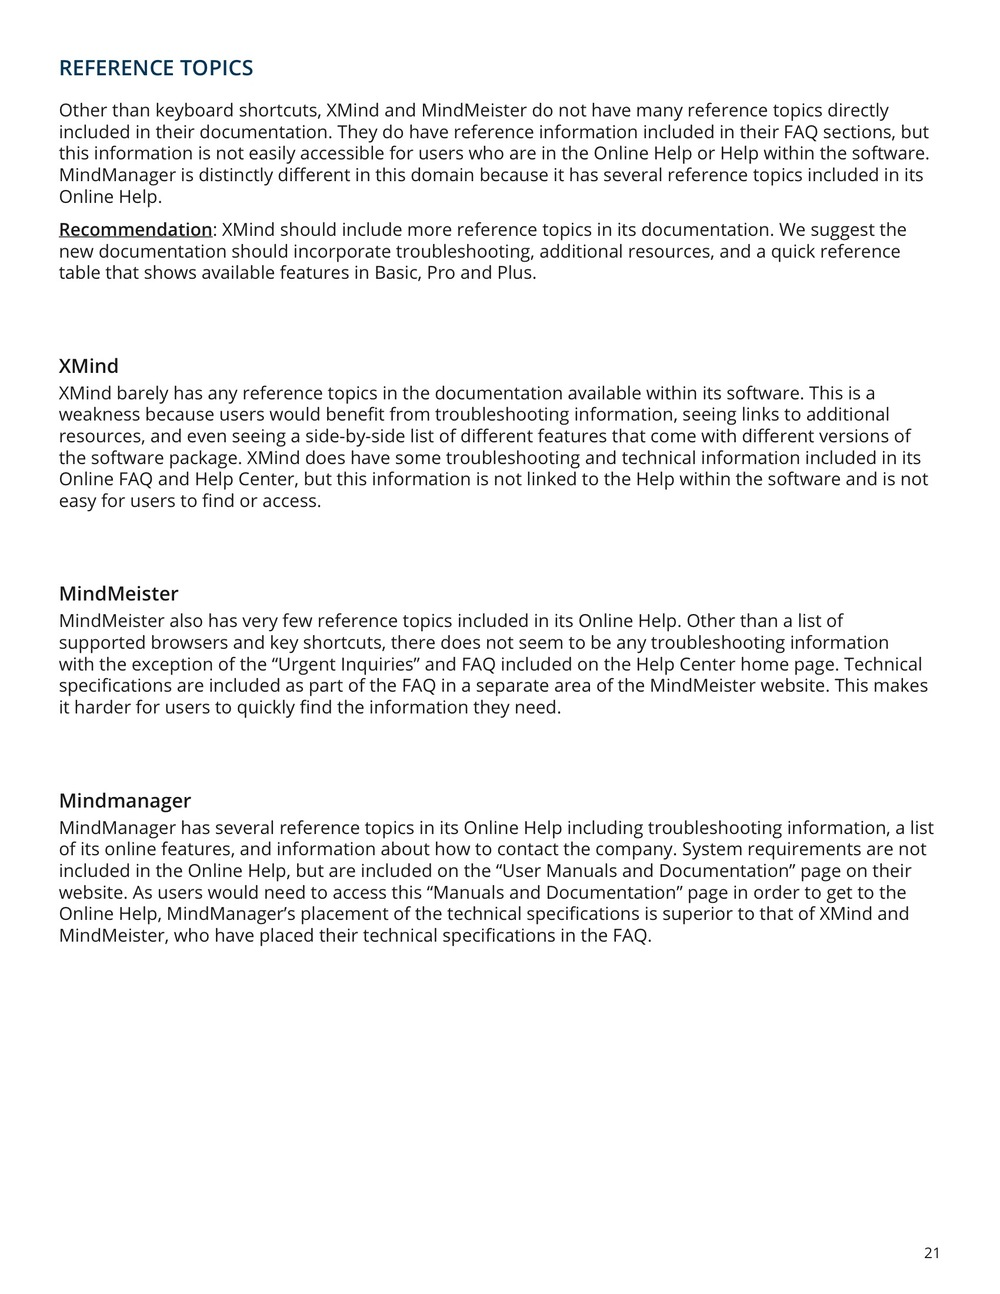 XMind Final Report_4-23-15 21-21.jpeg